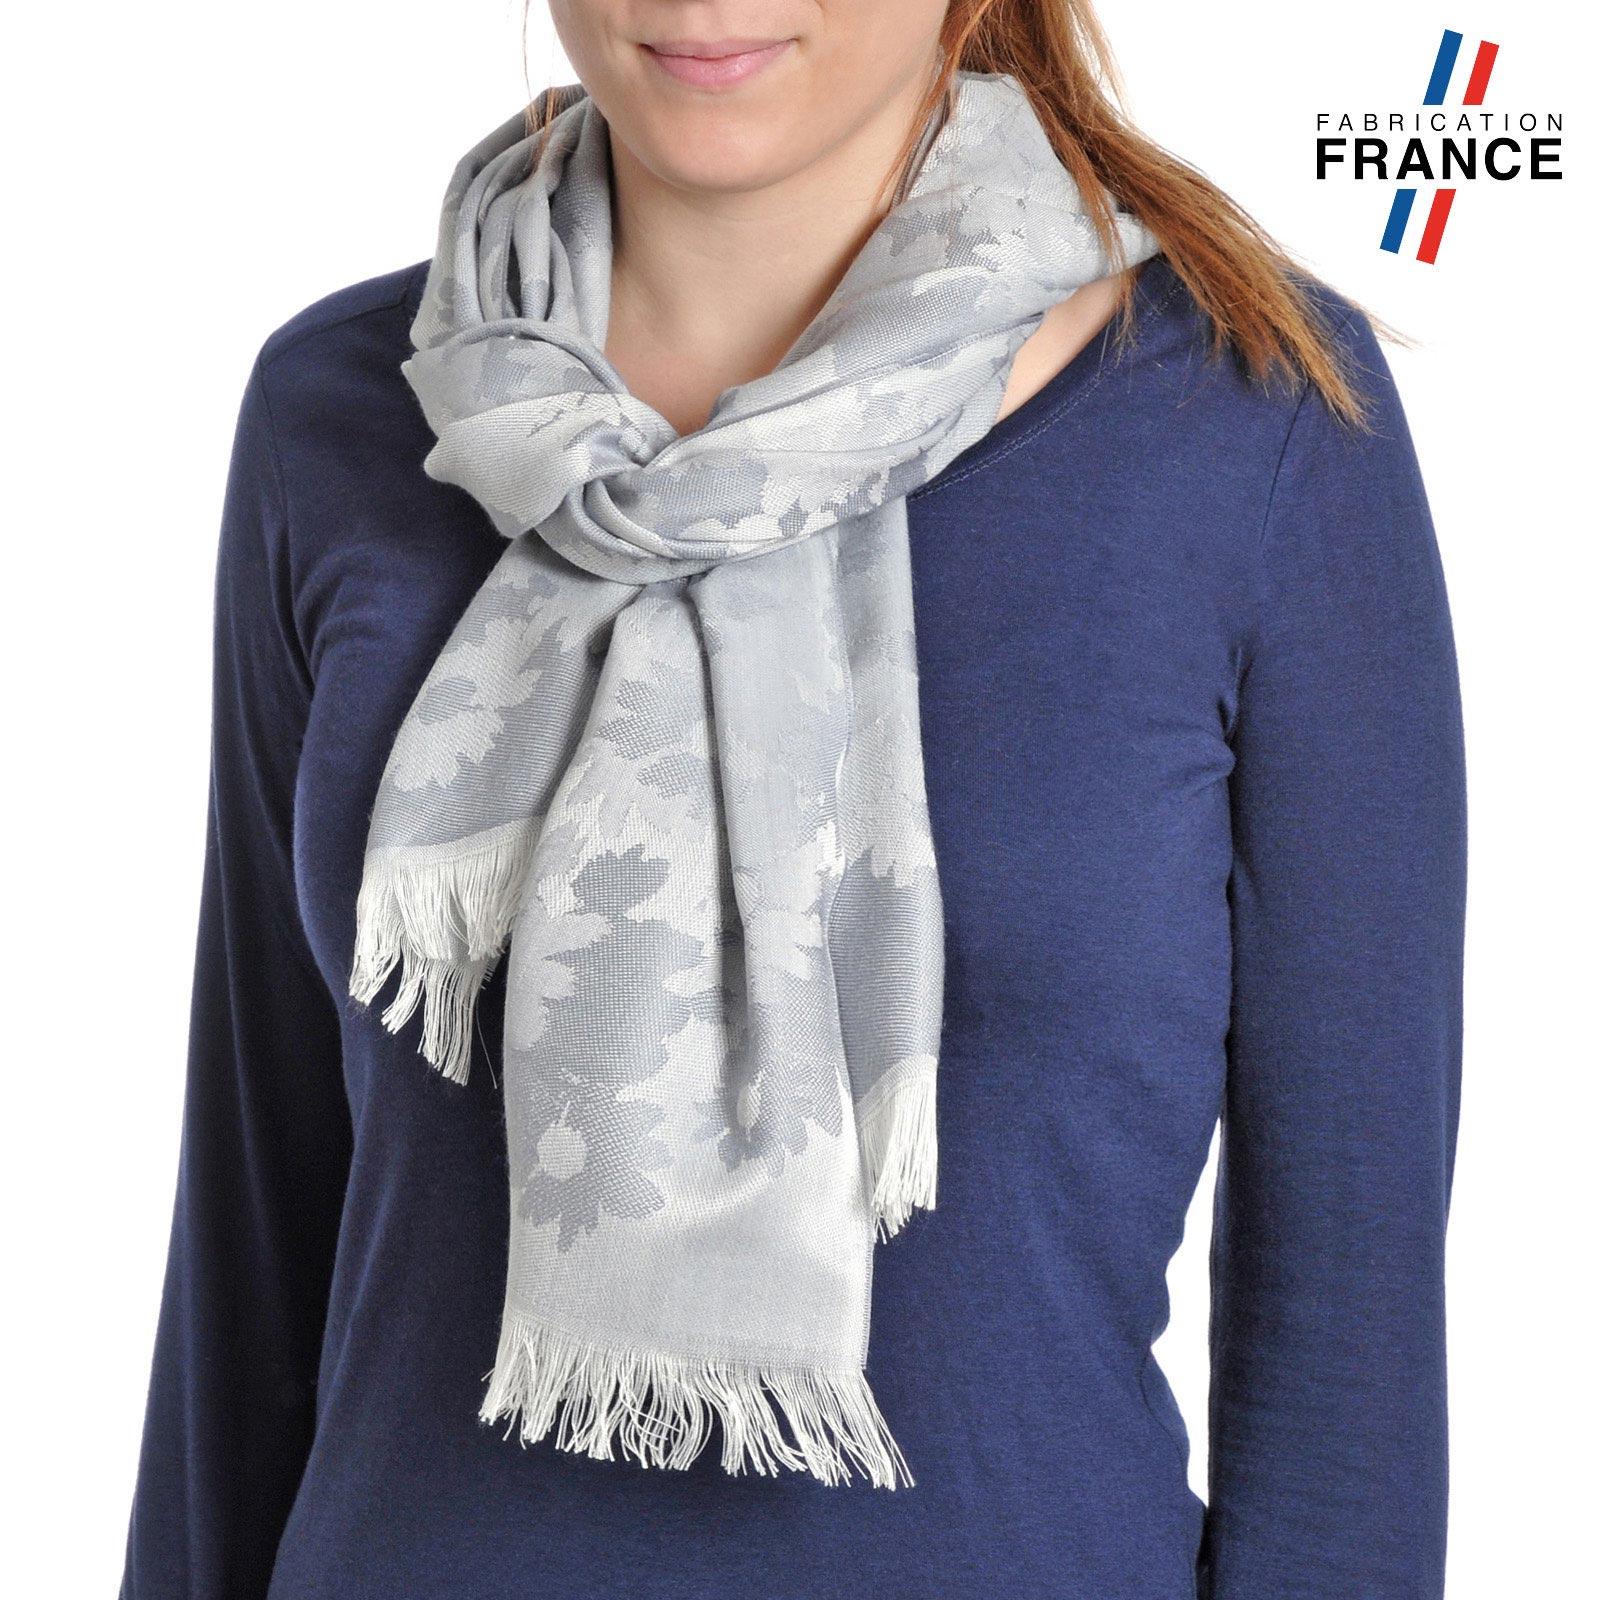 AT-04277-VF10-T-LB_FR-echarpe-legere-fleurs-gris-argent-fabrication-france